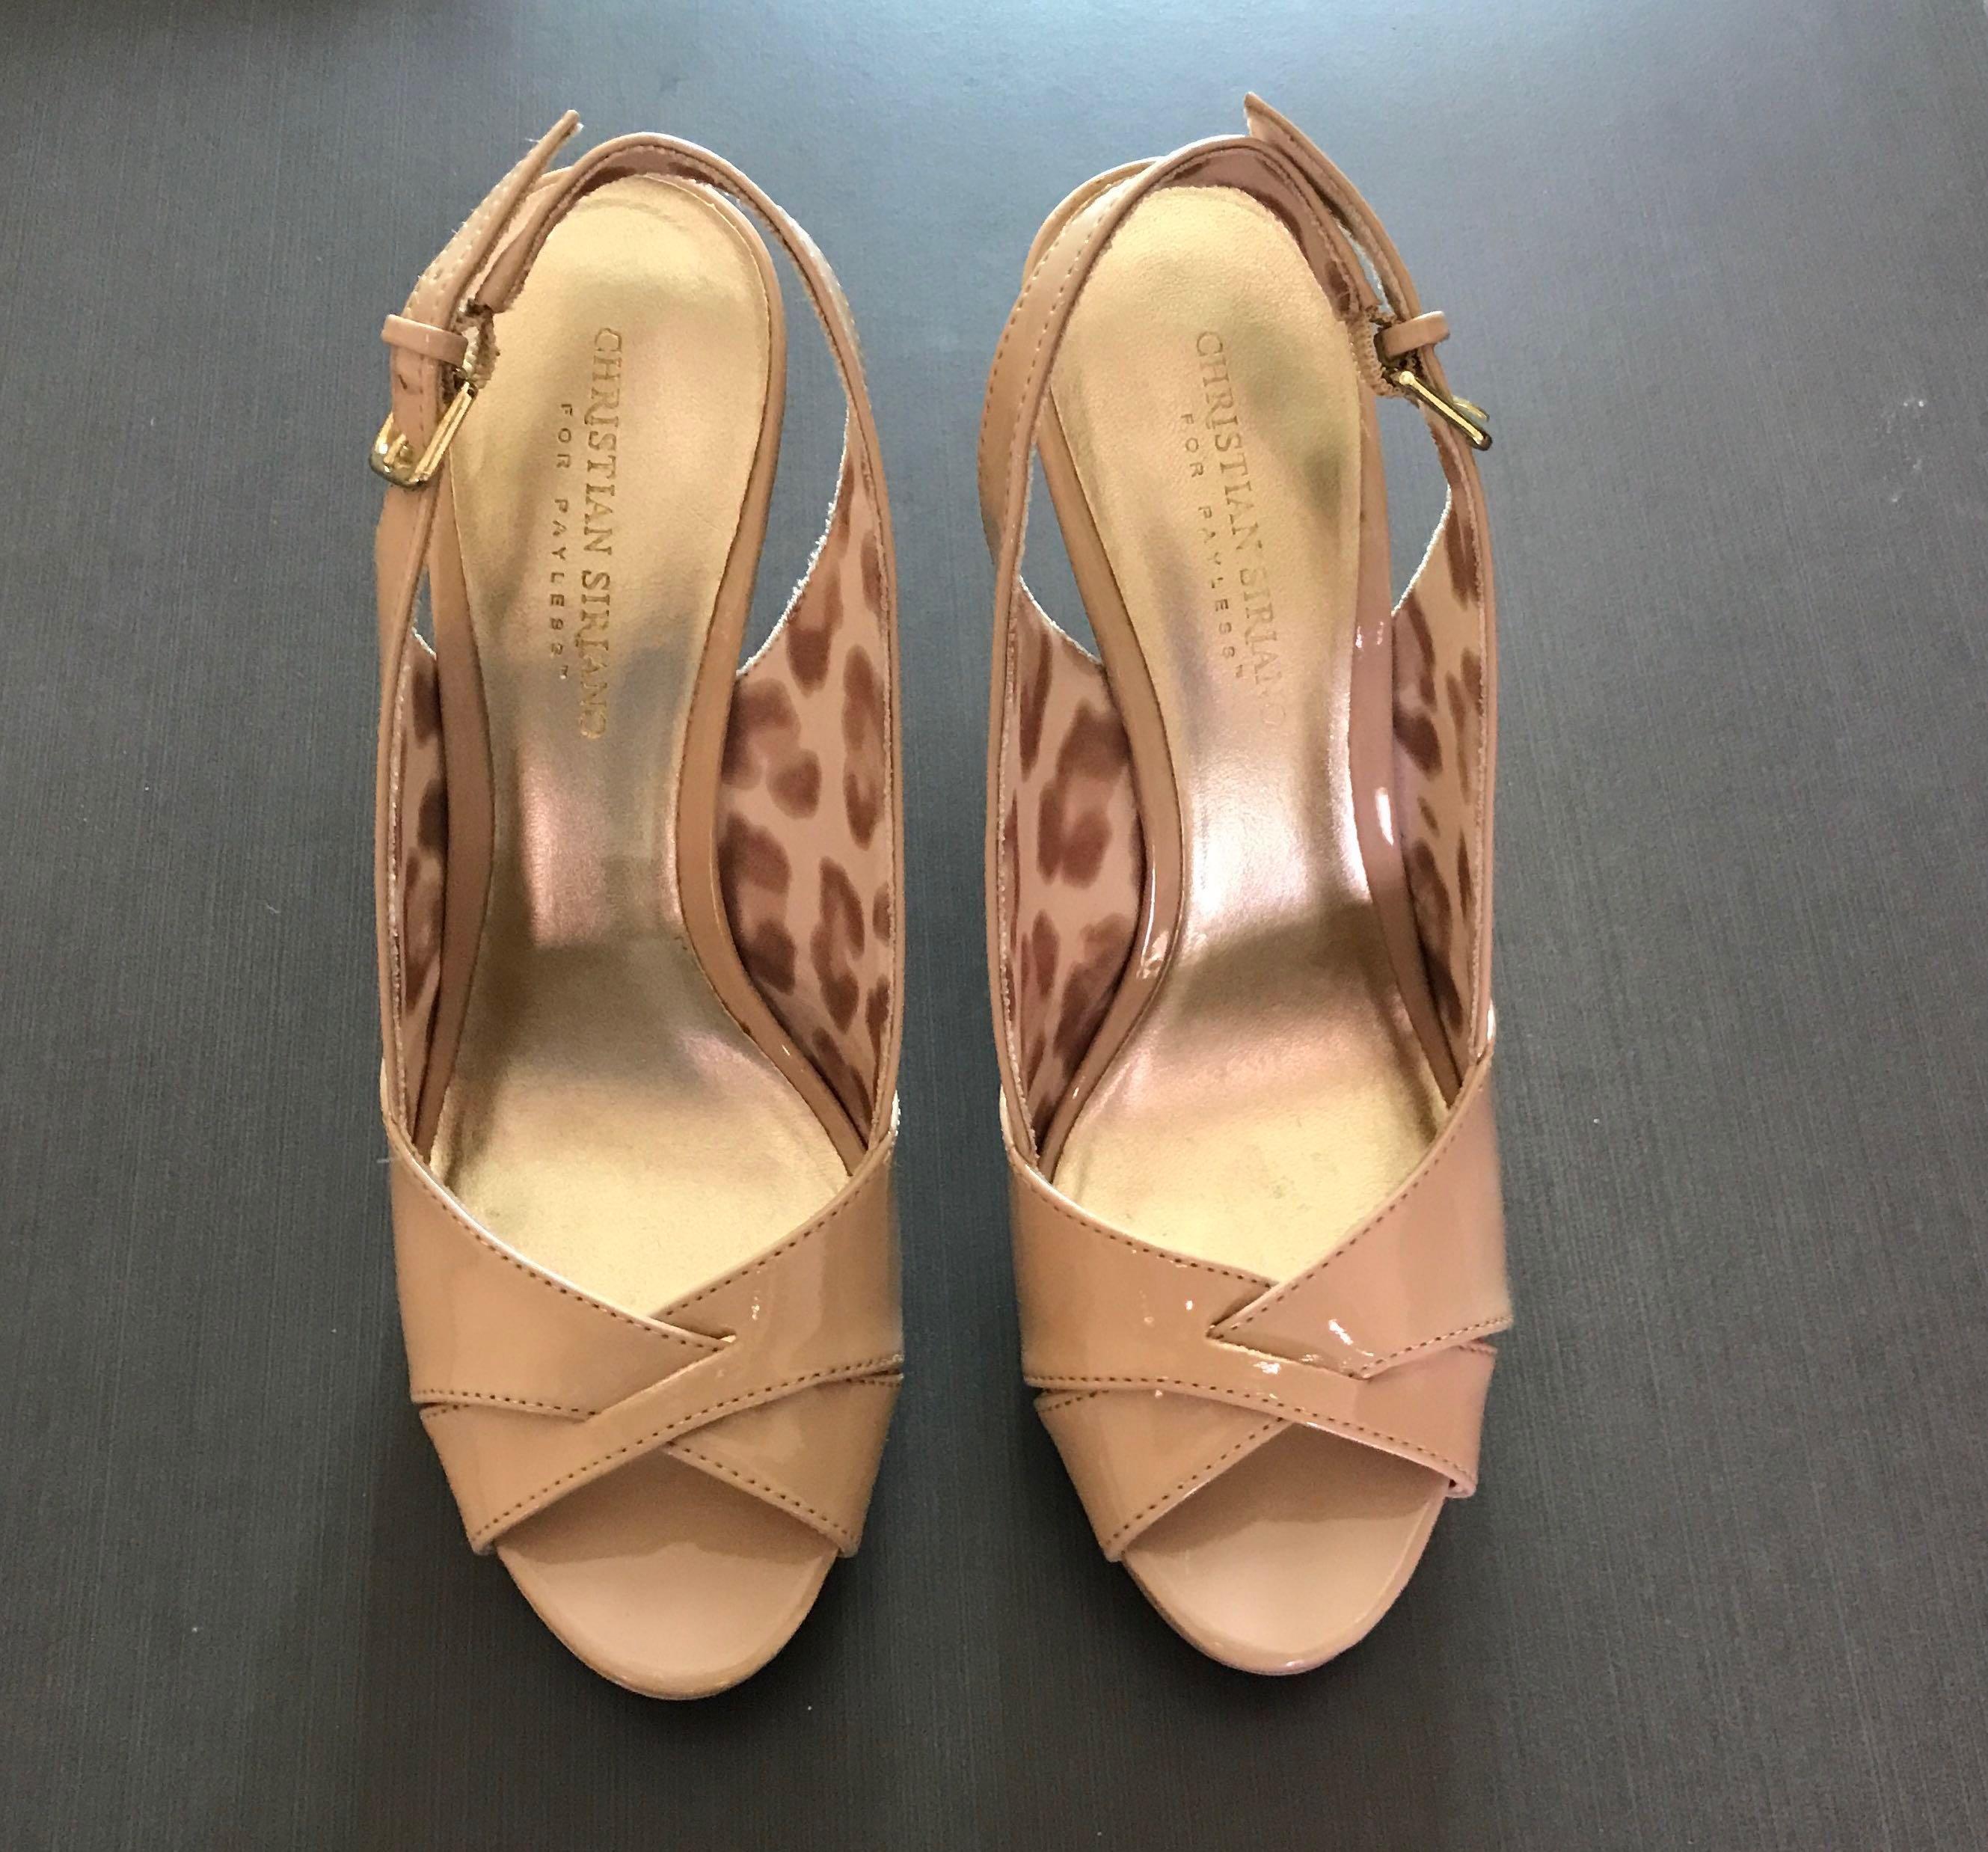 8d2c9df6aa Christian Siriano Payless classy nude patent peep toe heels, Women's ...